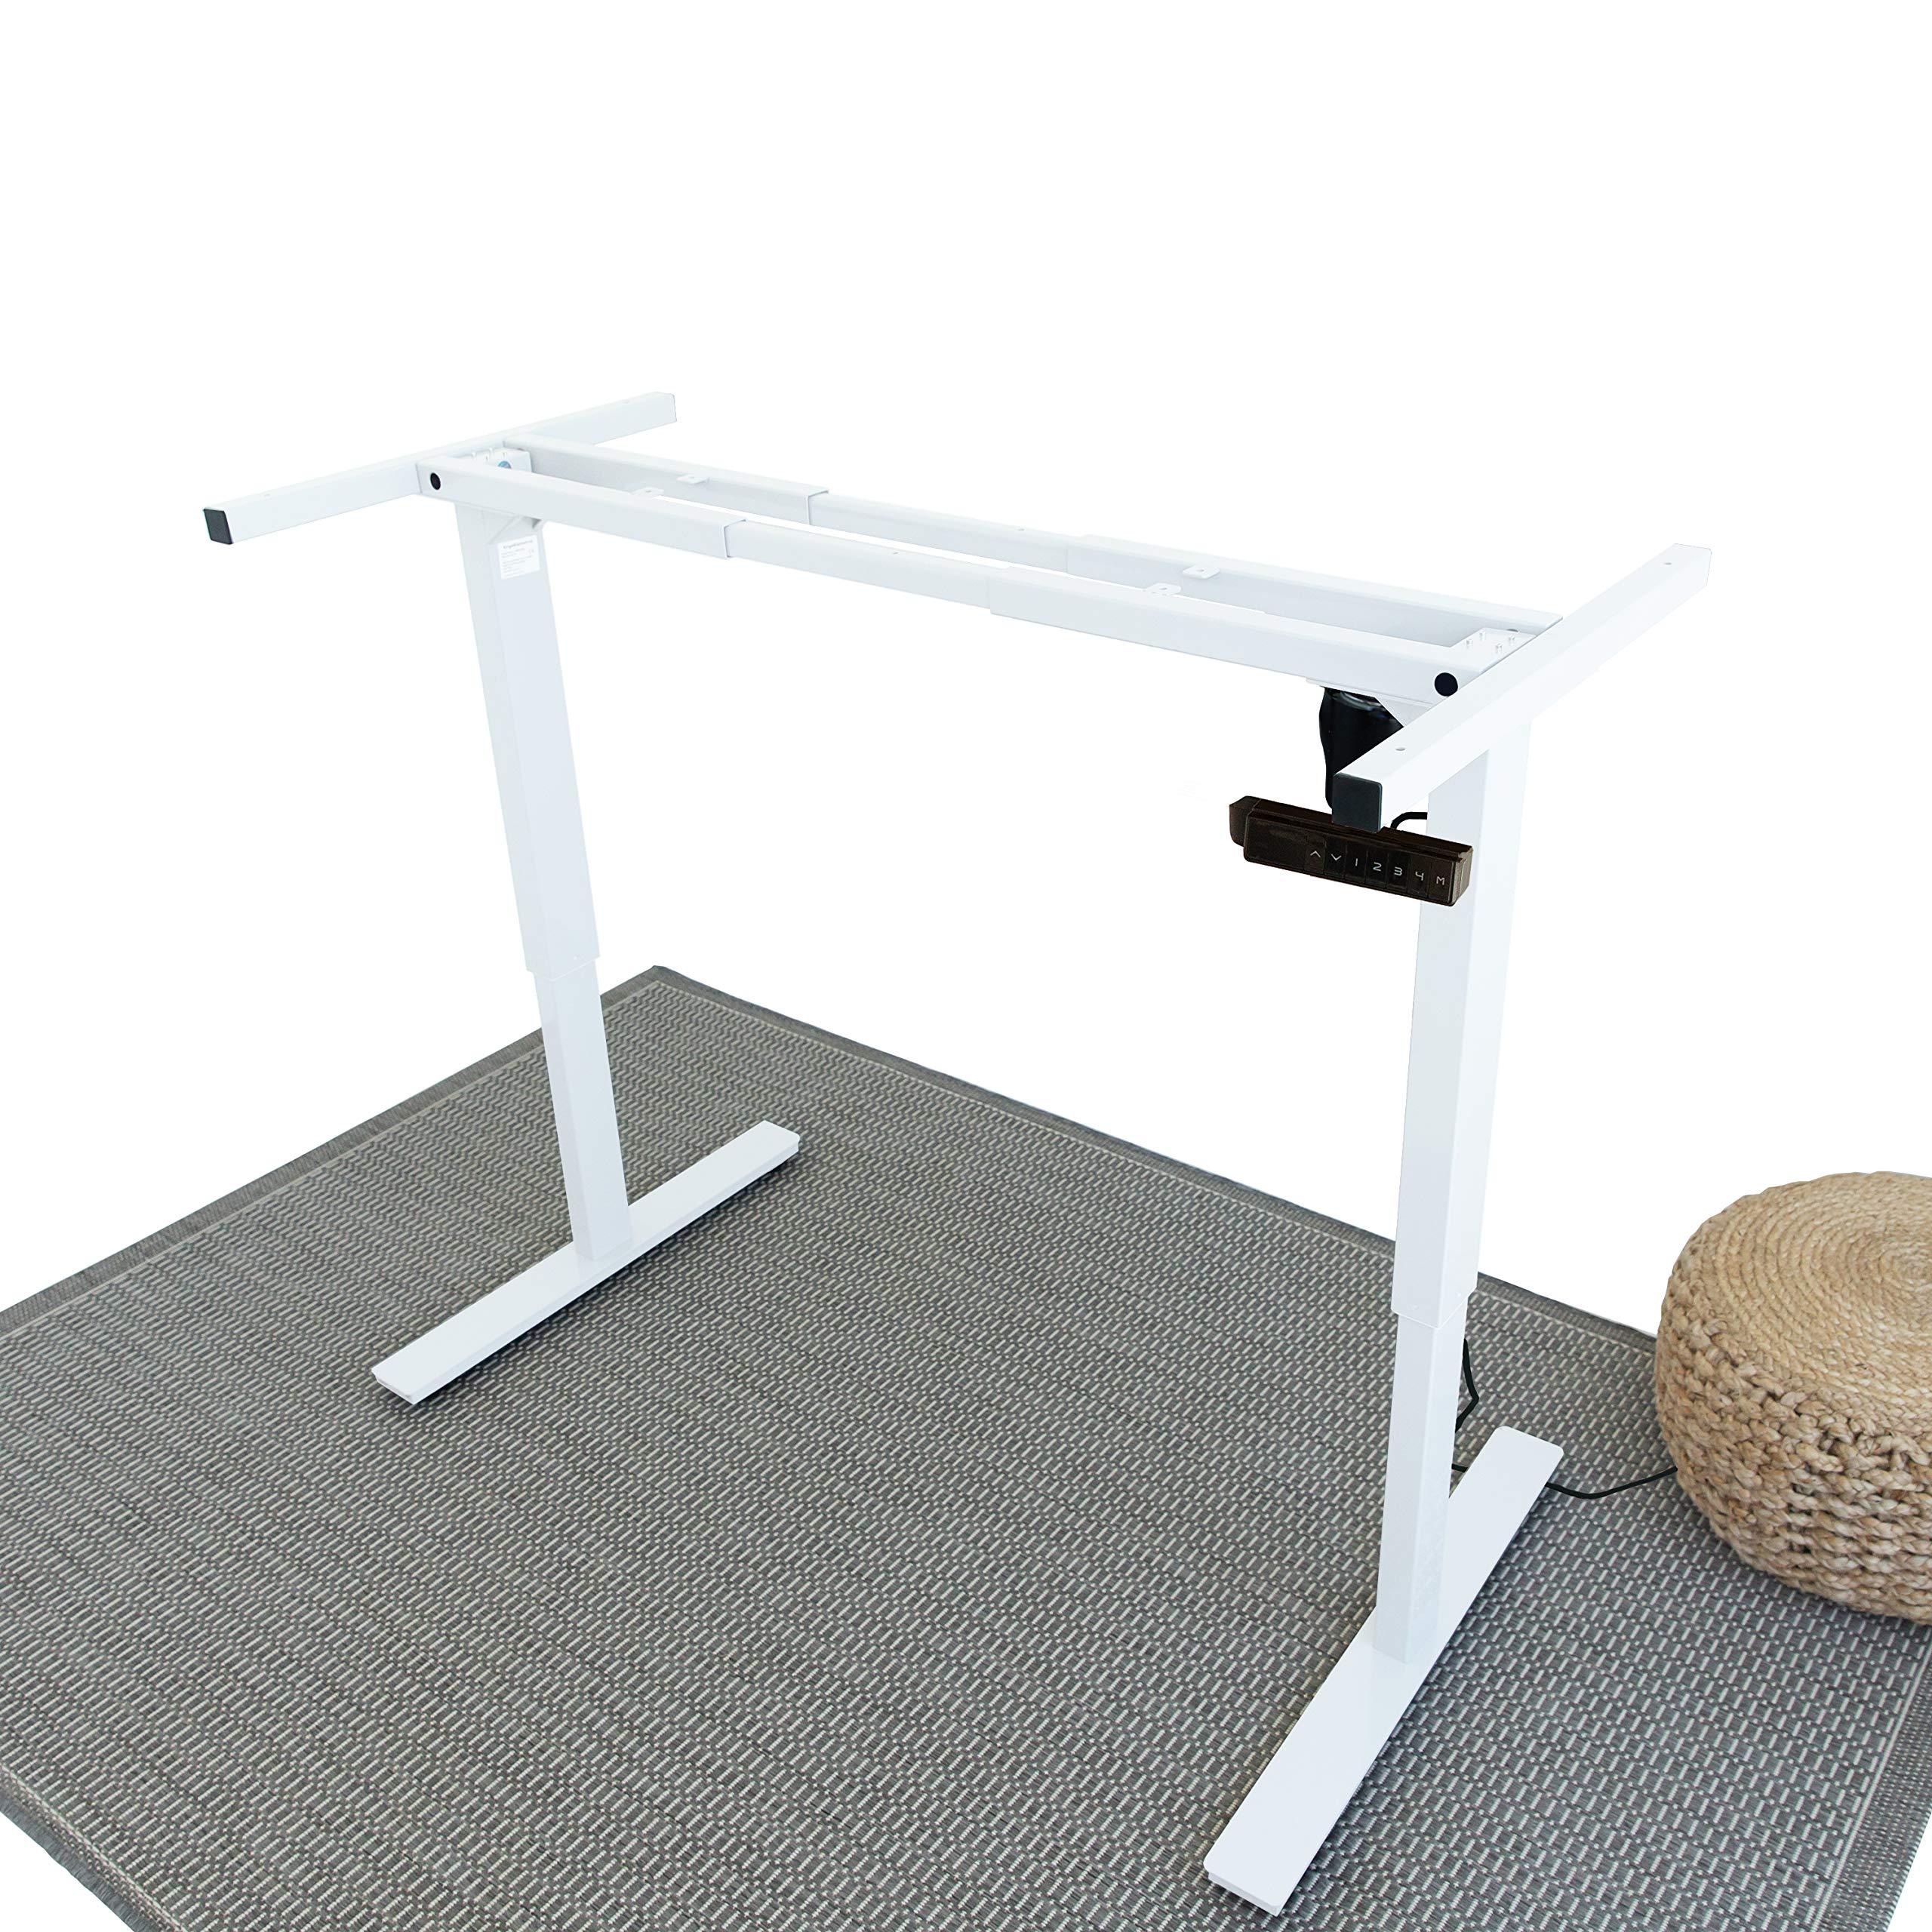 Ergo Elements Electric Height Adjustable Stand Up Desk Frame Workstation, Programmable Ergonomic Standing Base, White by Ergo Elements